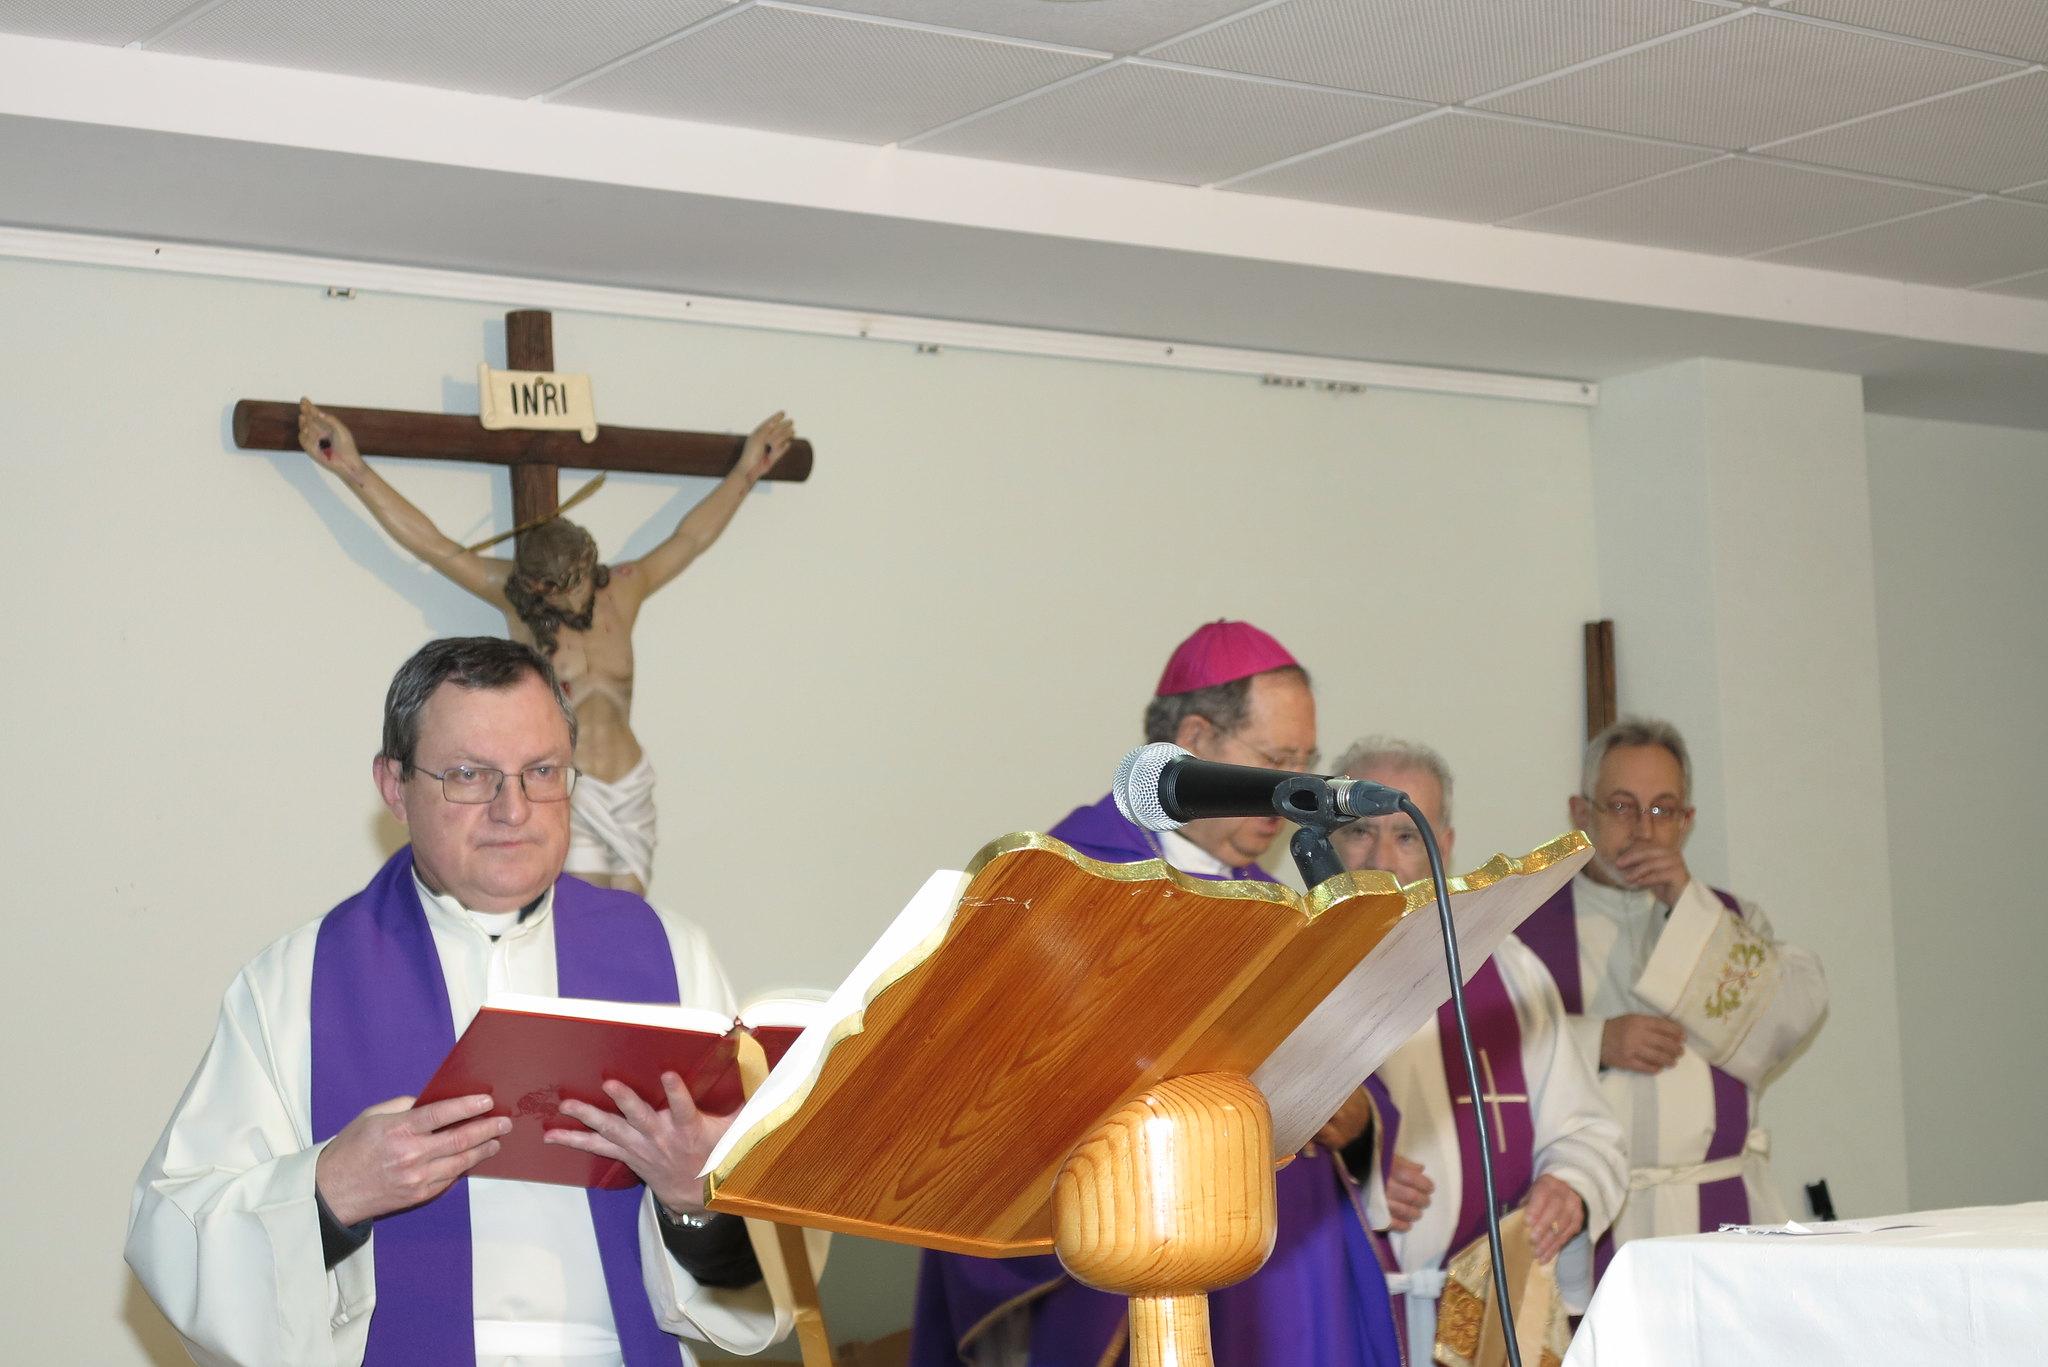 (2016-02-13) - Inauguración Virgen de Lourdes, La Molineta - Archivo La Molineta 2 (07)